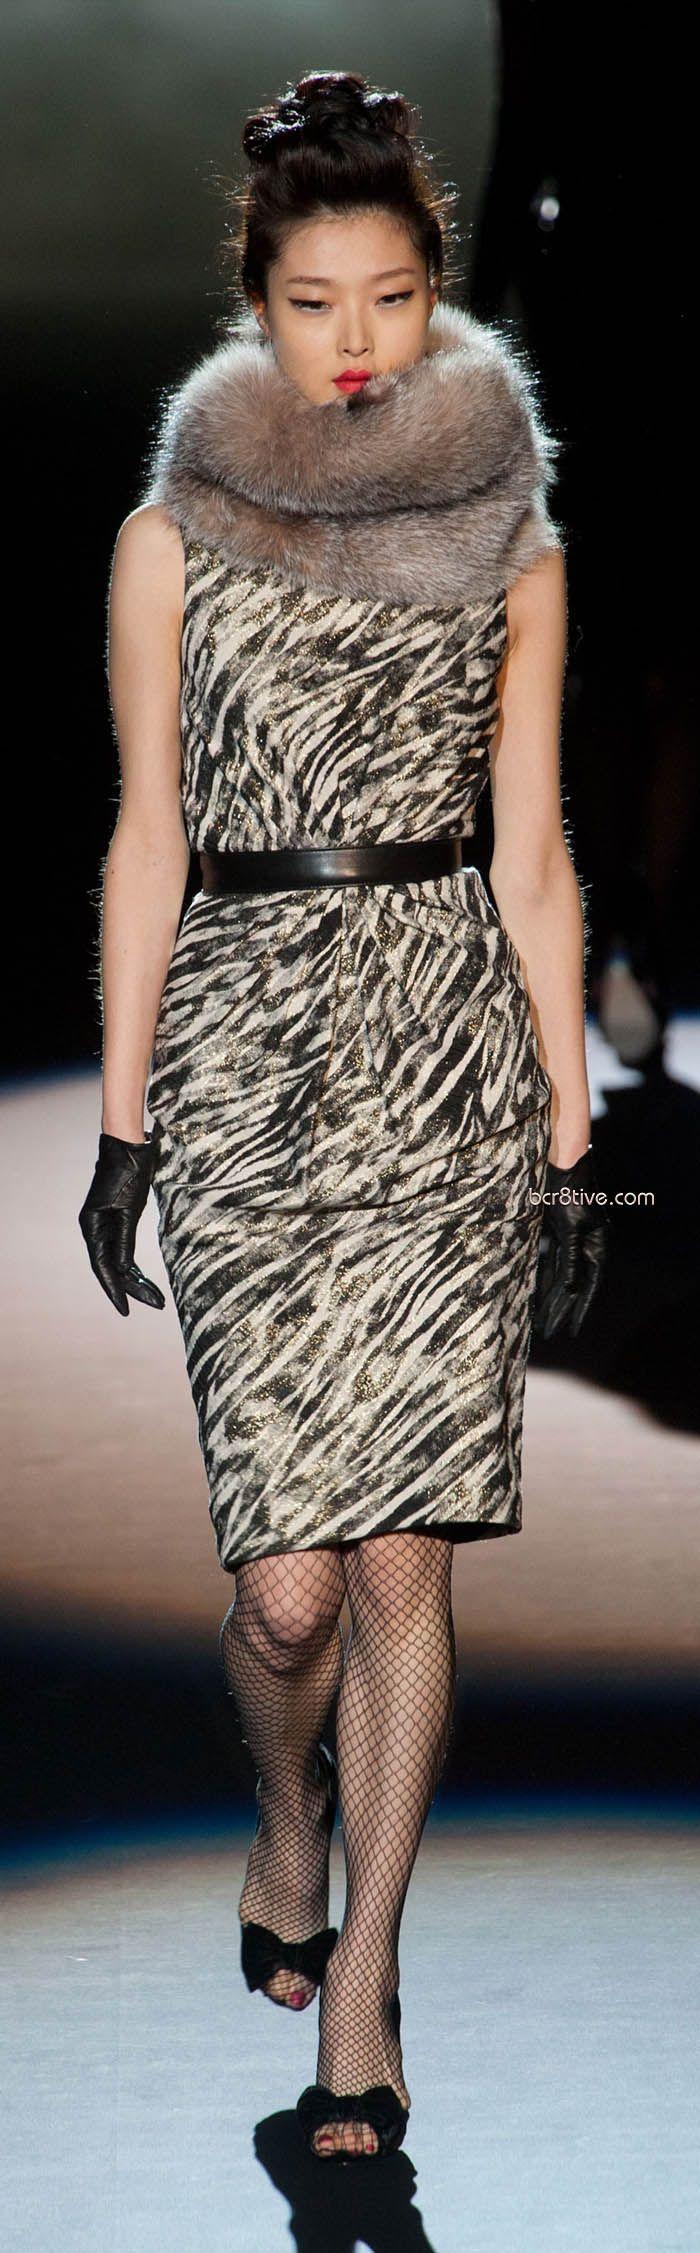 Mercedes benz fashion week amsterdam fall winter 2018 dresses